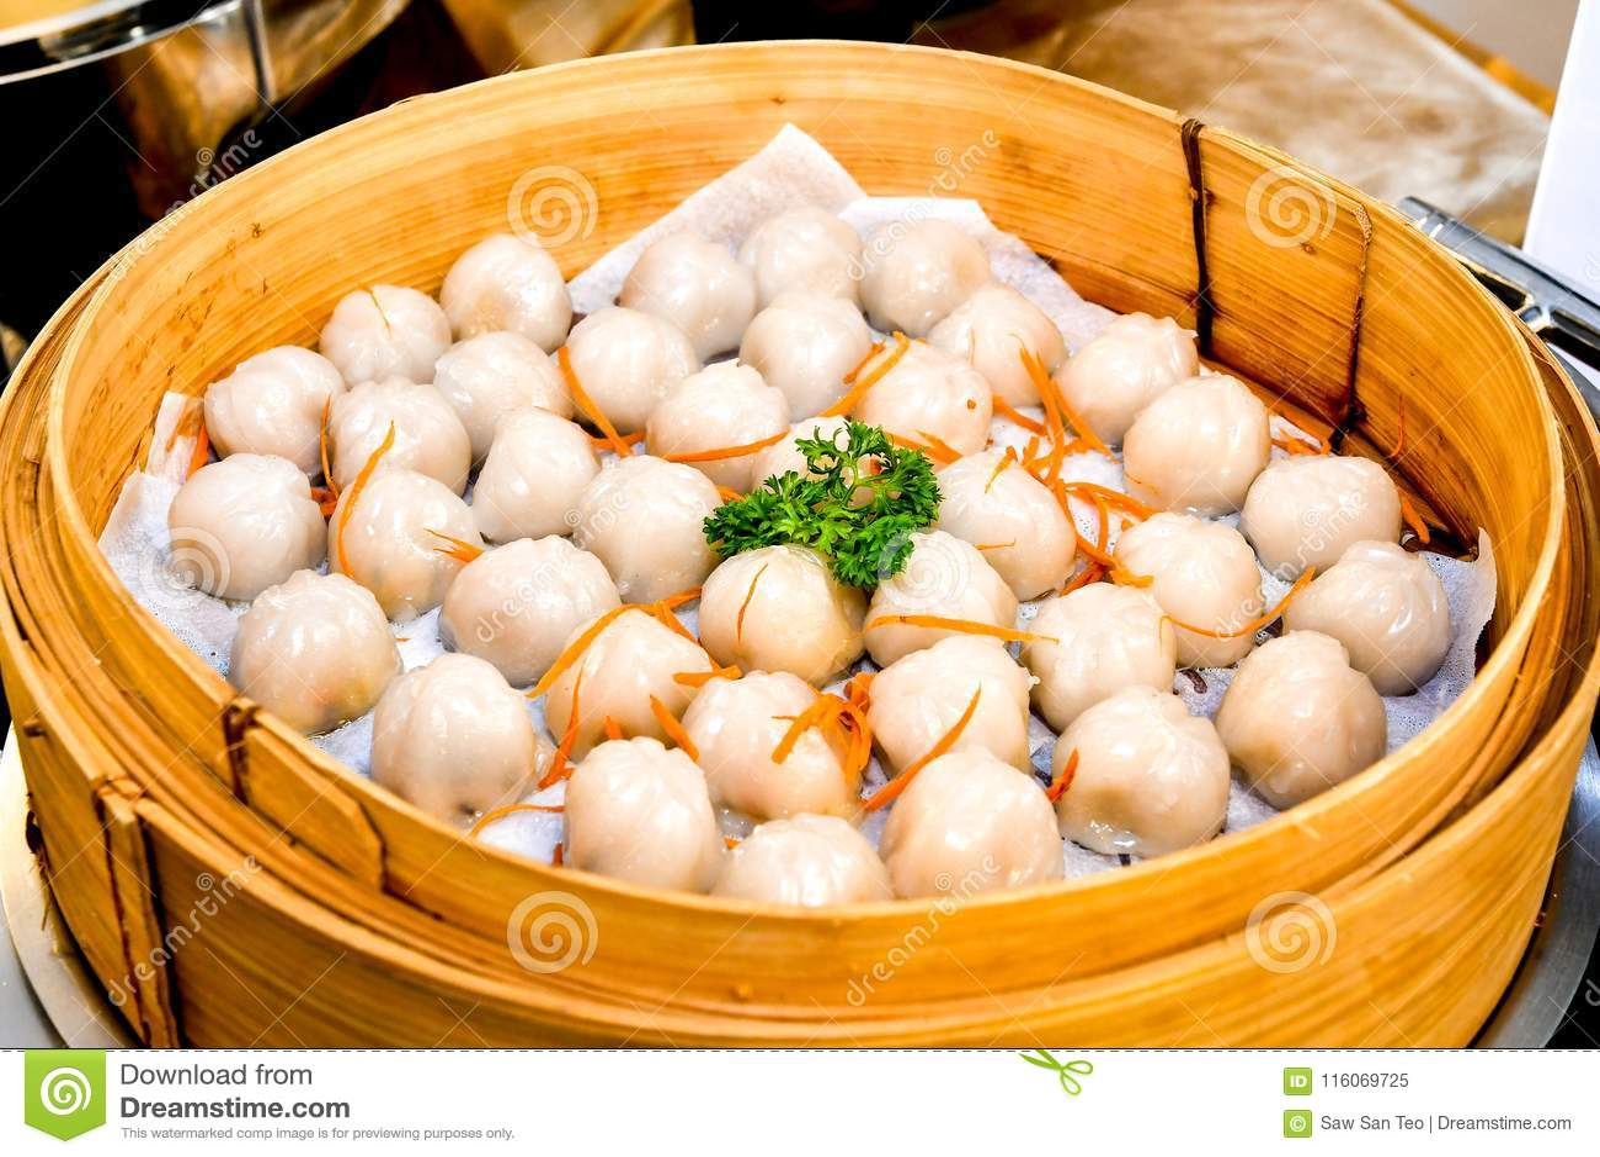 Crystal Skin Dumplings cocido al vapor